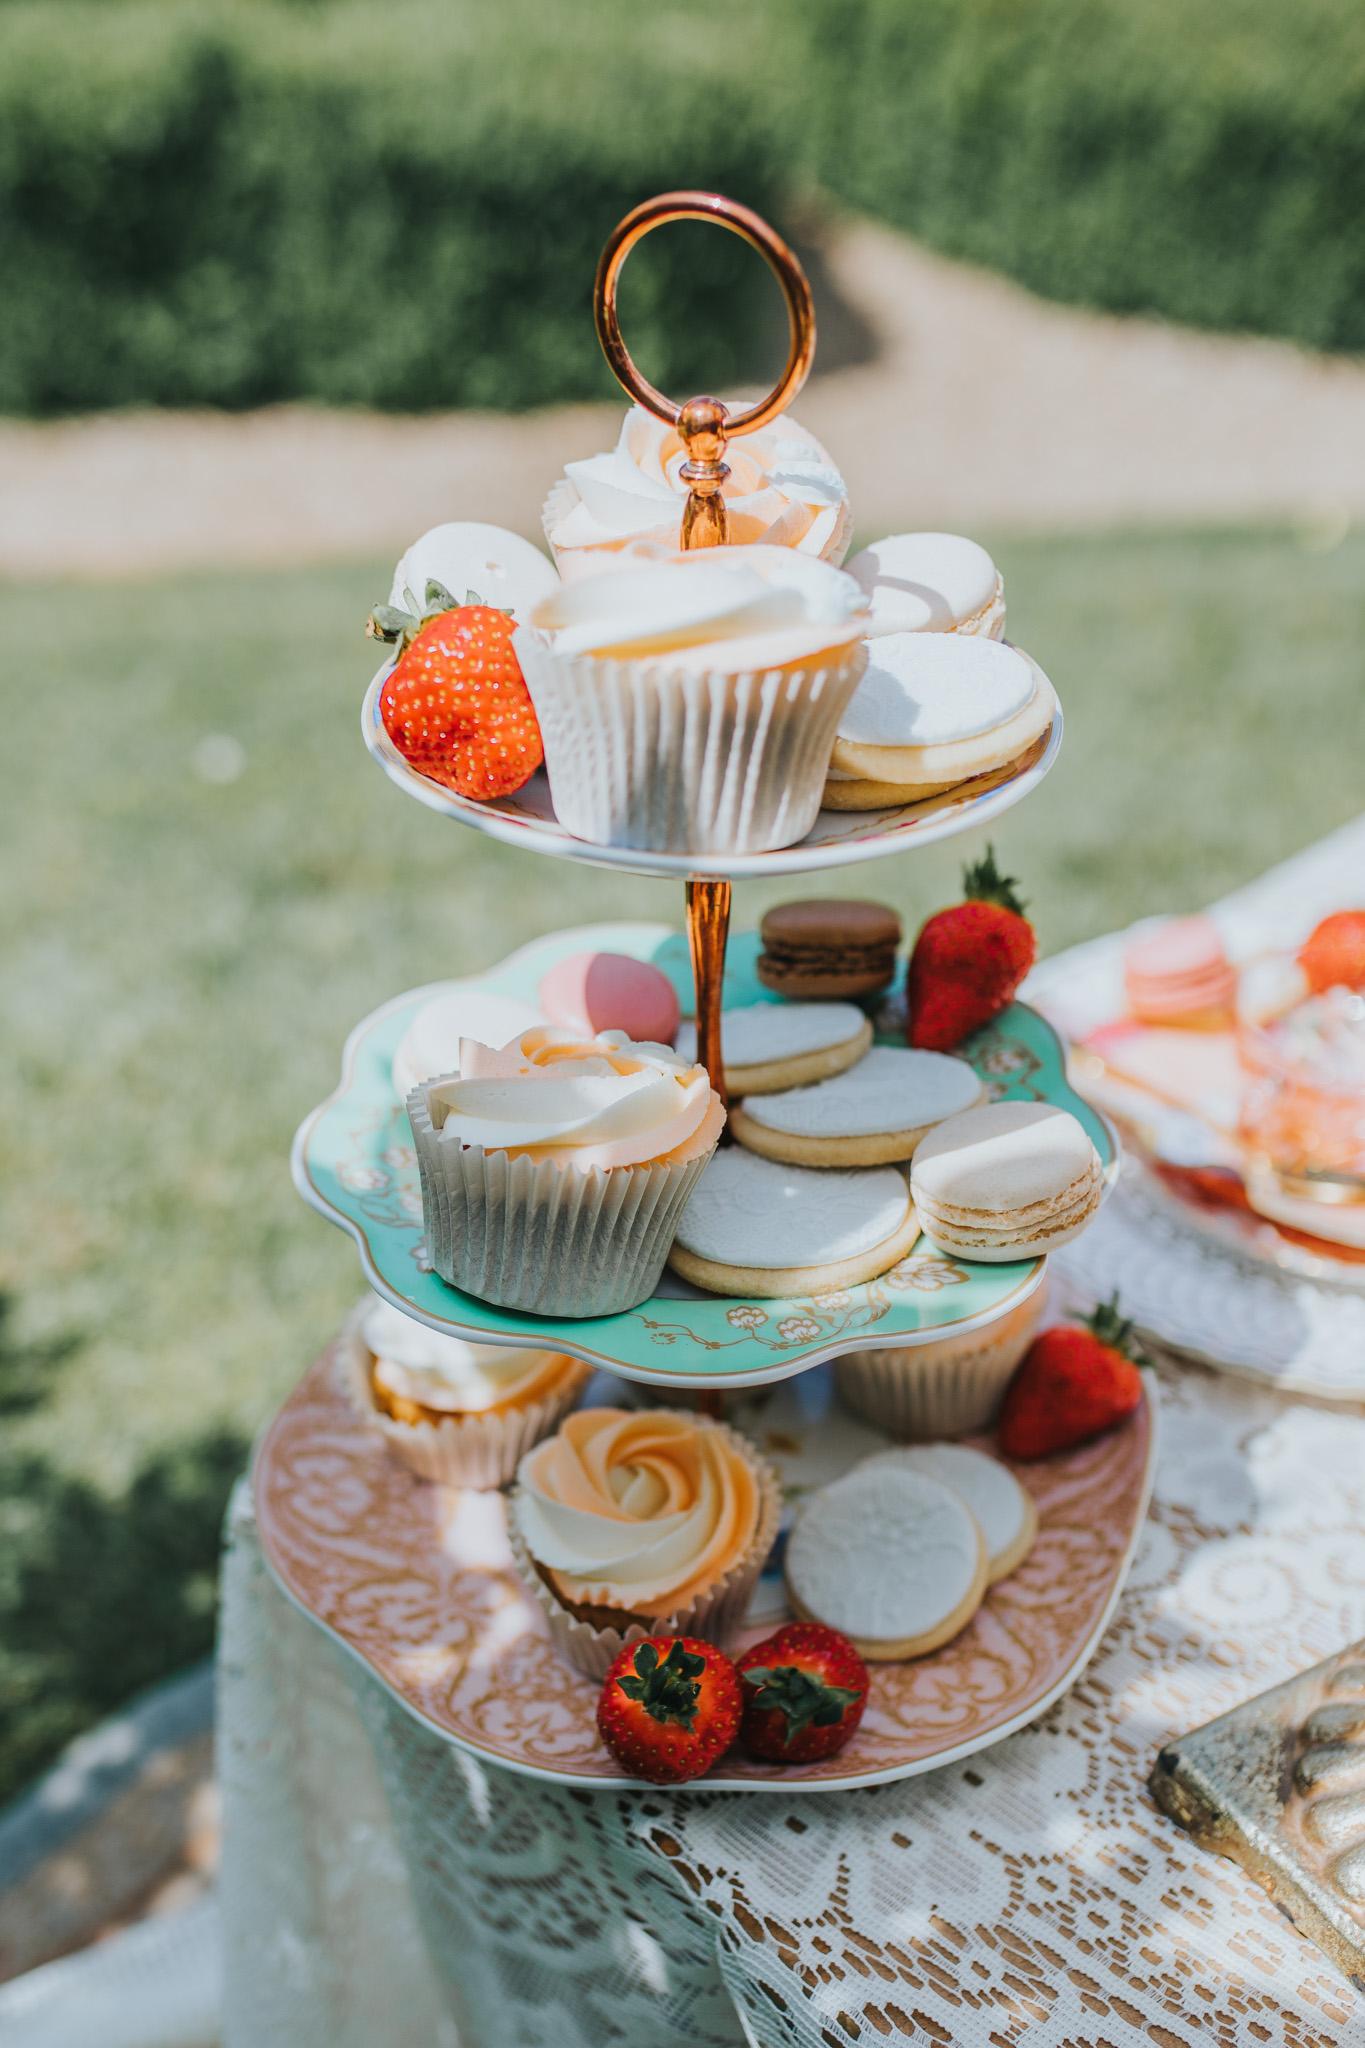 wedding cake stand - wedding cupcakes - unique wedding cakes on vintage cake stand